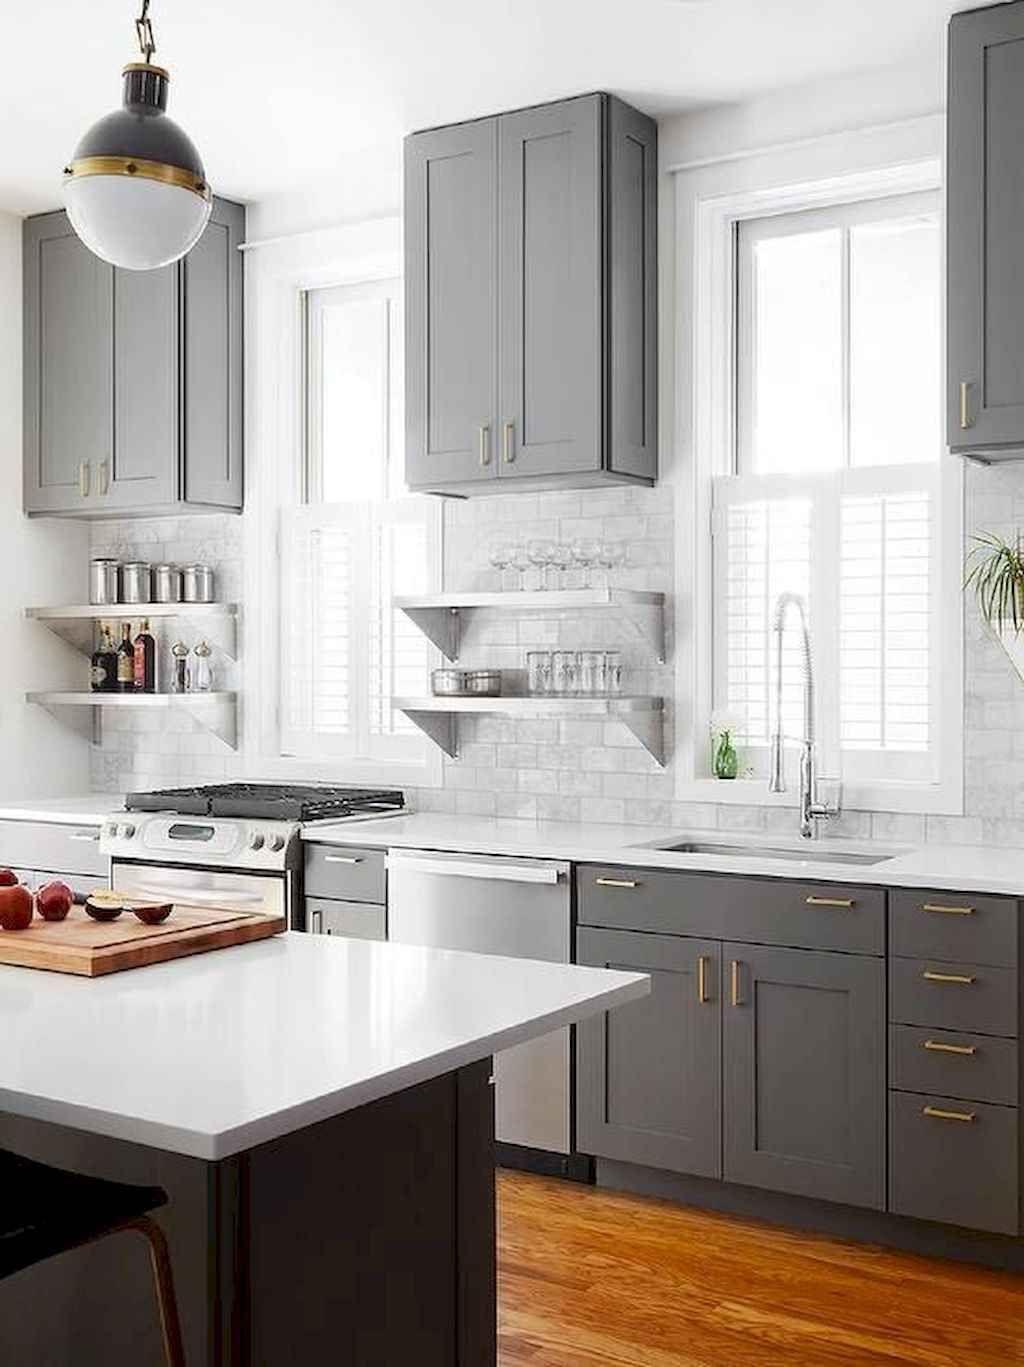 75 Farmhouse Gray Kitchen Cabinet Design Ideas #graykitchencabinets